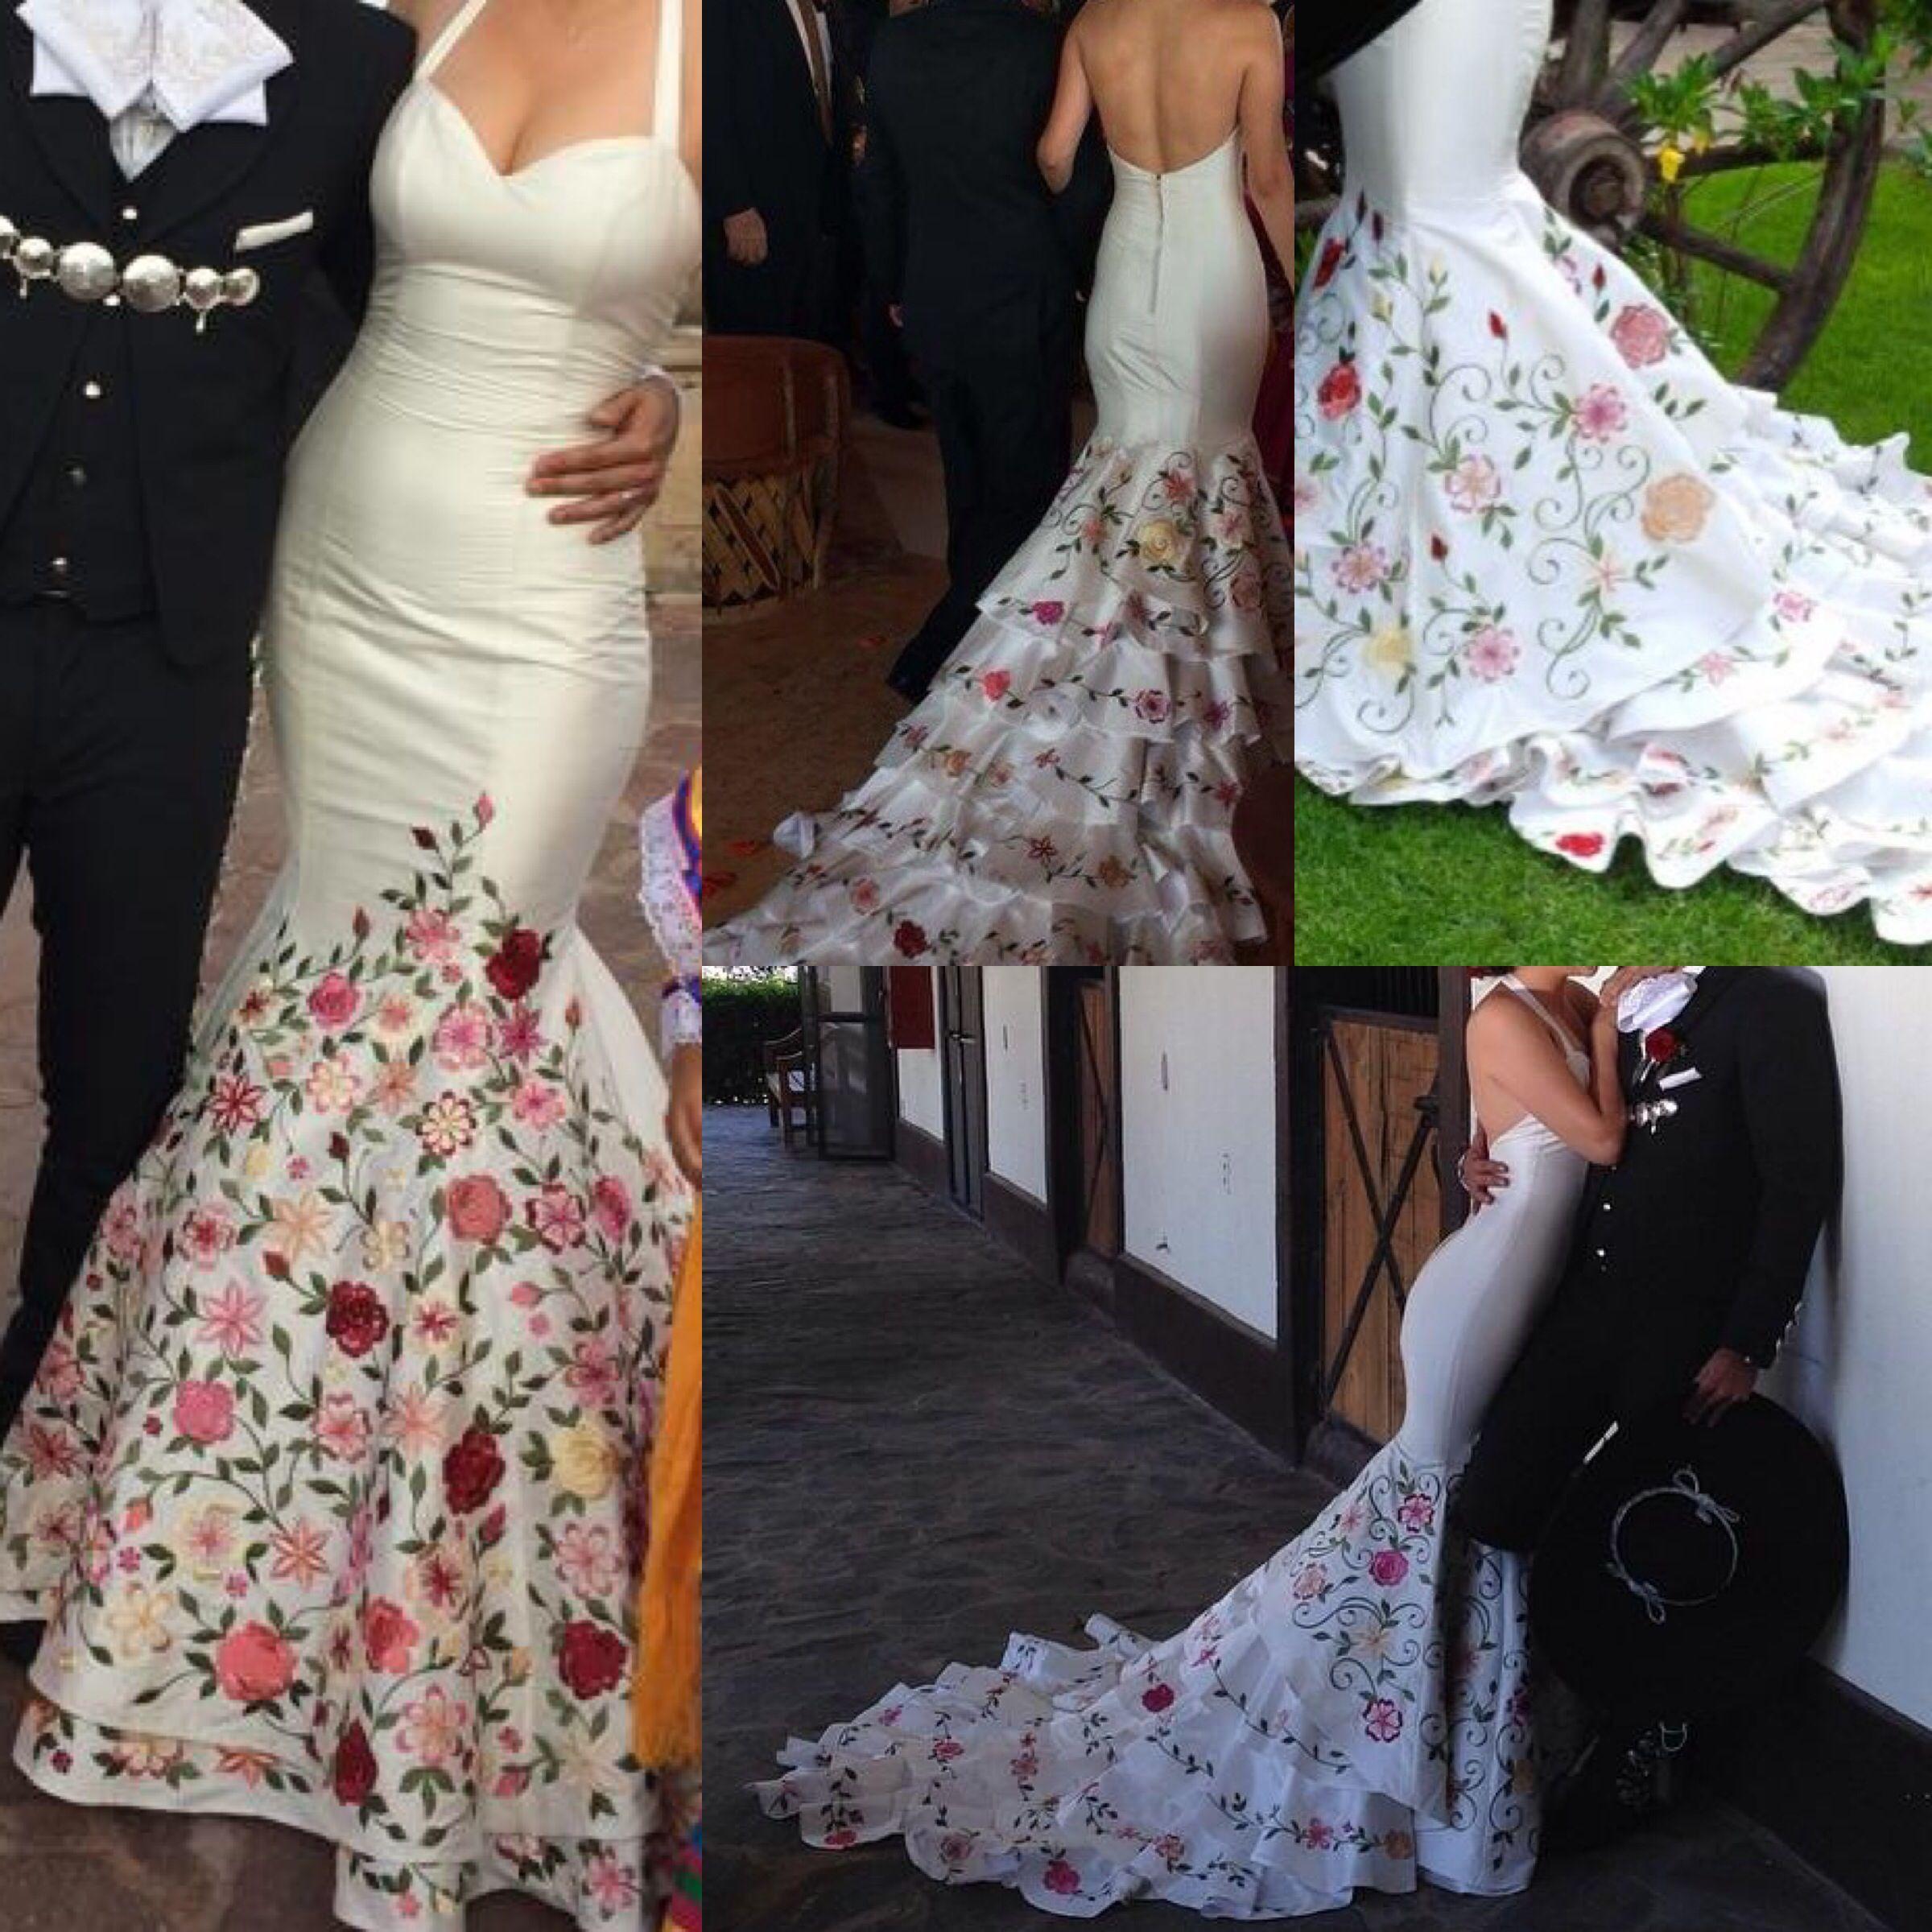 mexican wedding dress Ana patricias wedding dress Beautiful simple unique